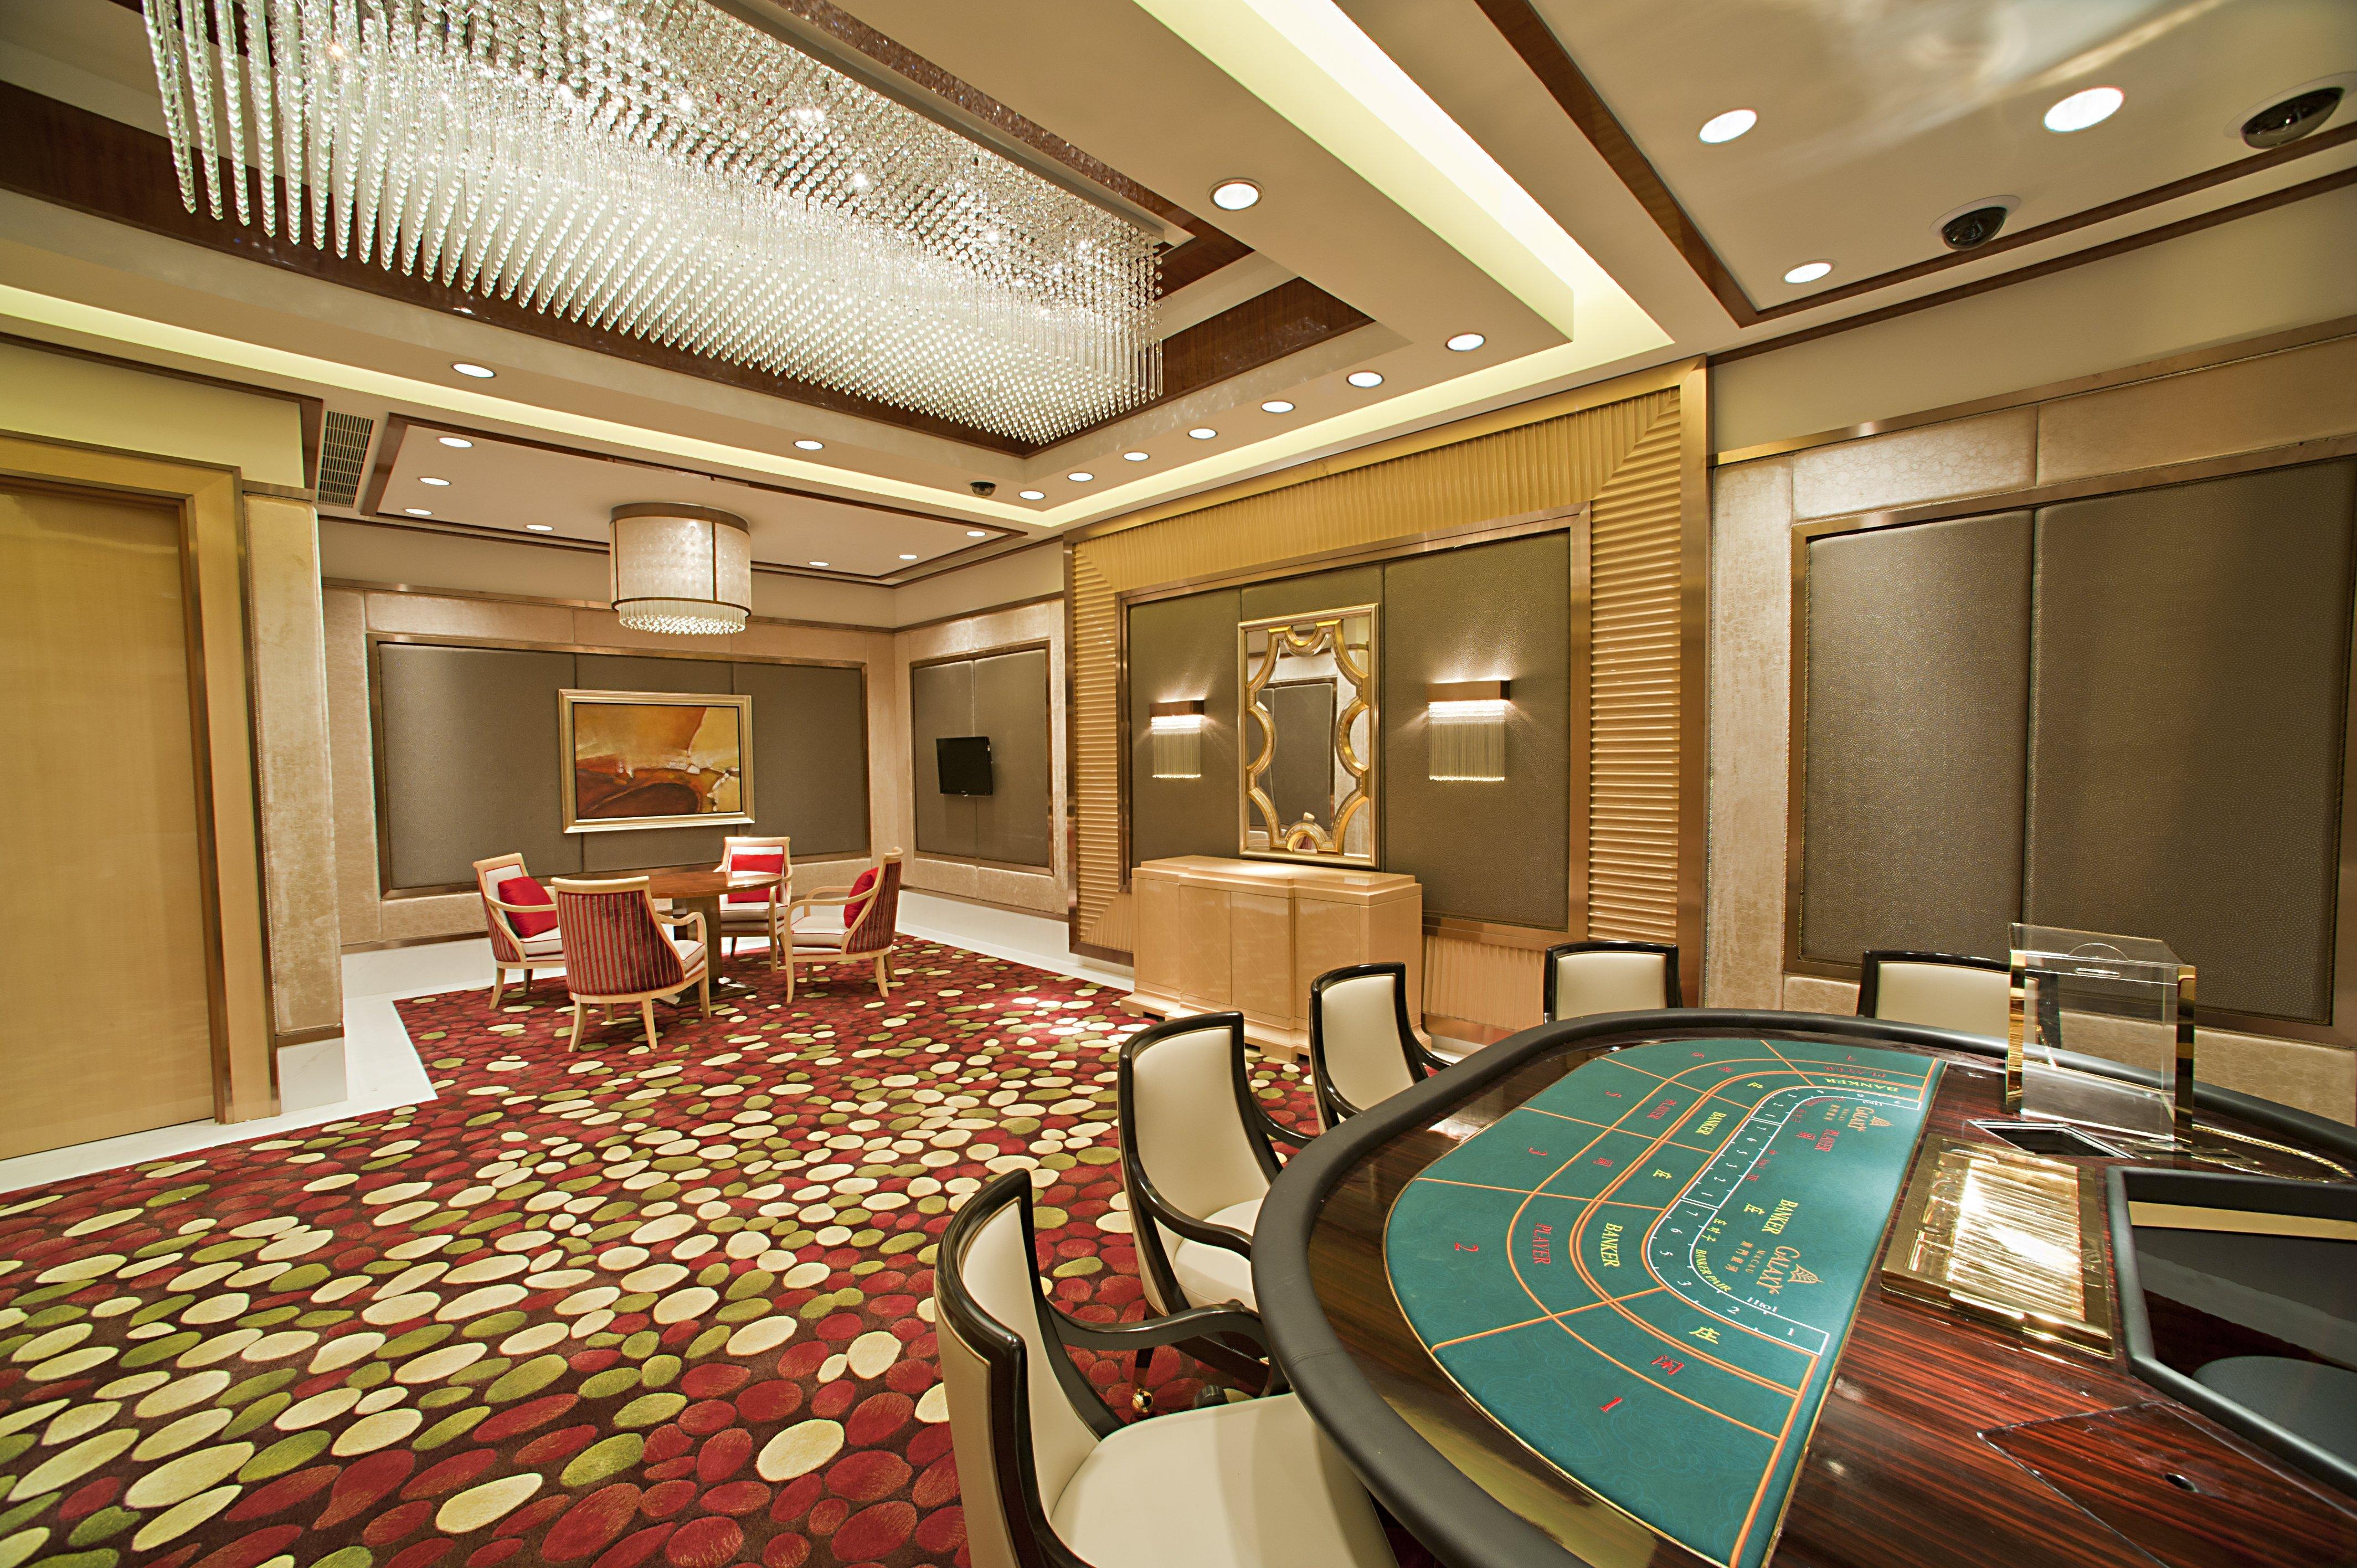 Macau casino free room